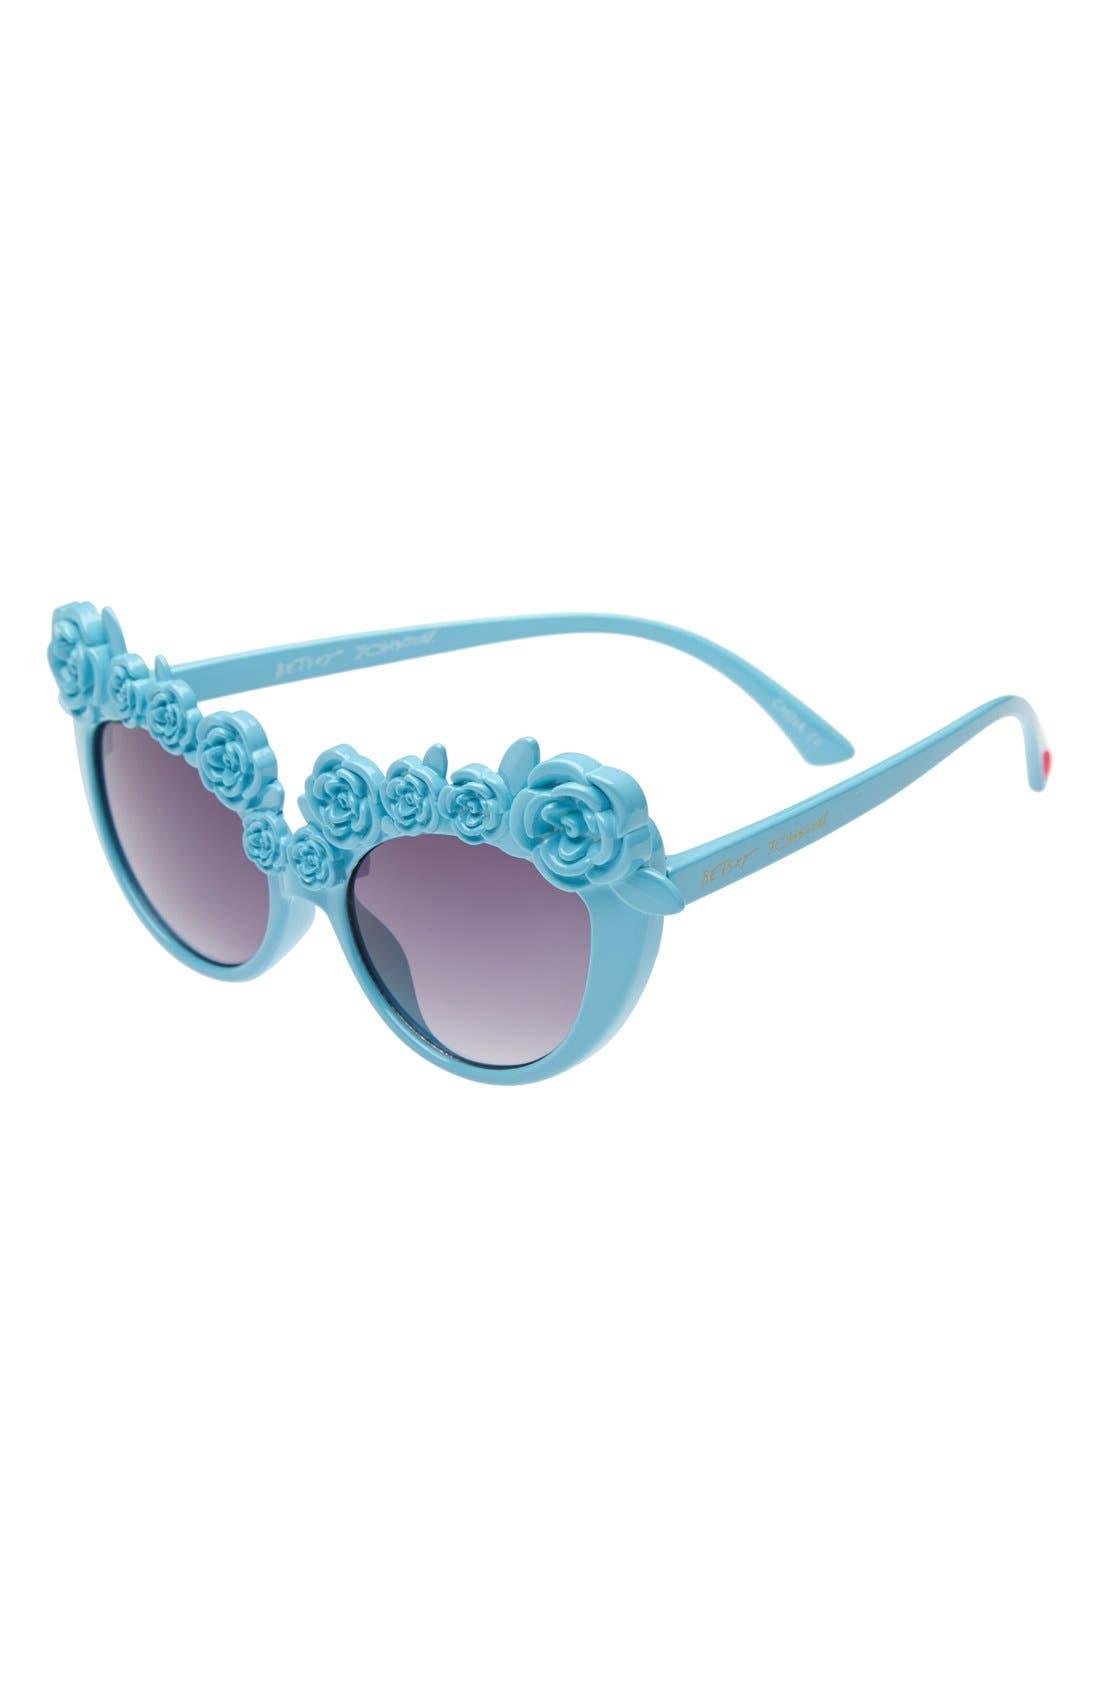 Cat Eye Sunglasses,                             Main thumbnail 1, color,                             441